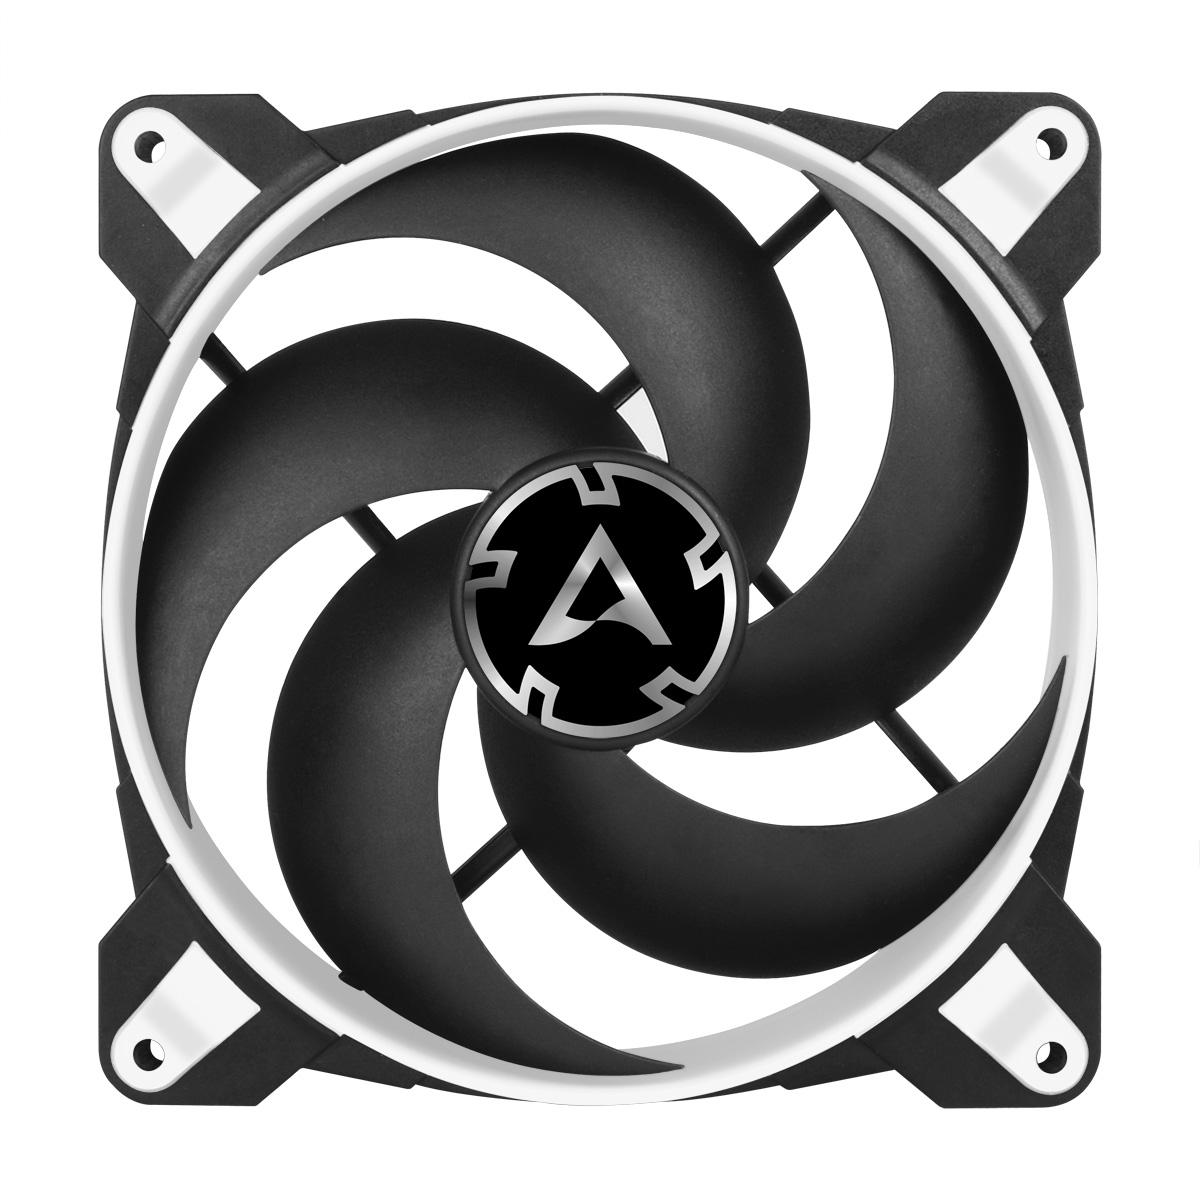 BioniX_P140_white_G02